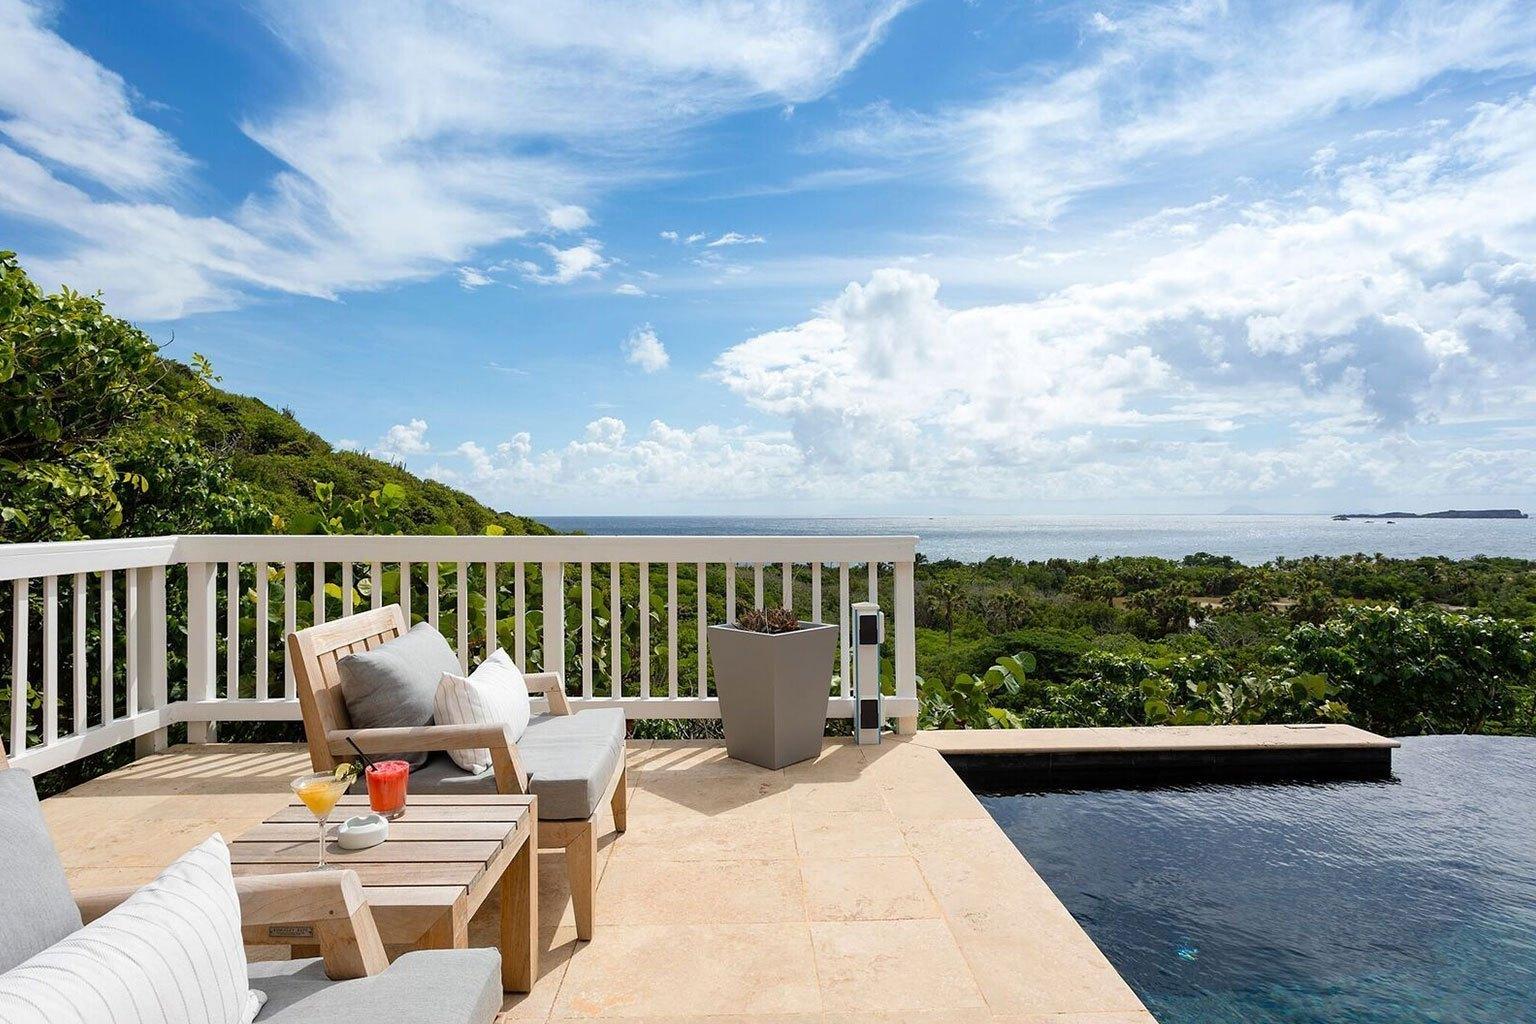 Hotel le toiny in der karibik designreisen for Designhotel barth